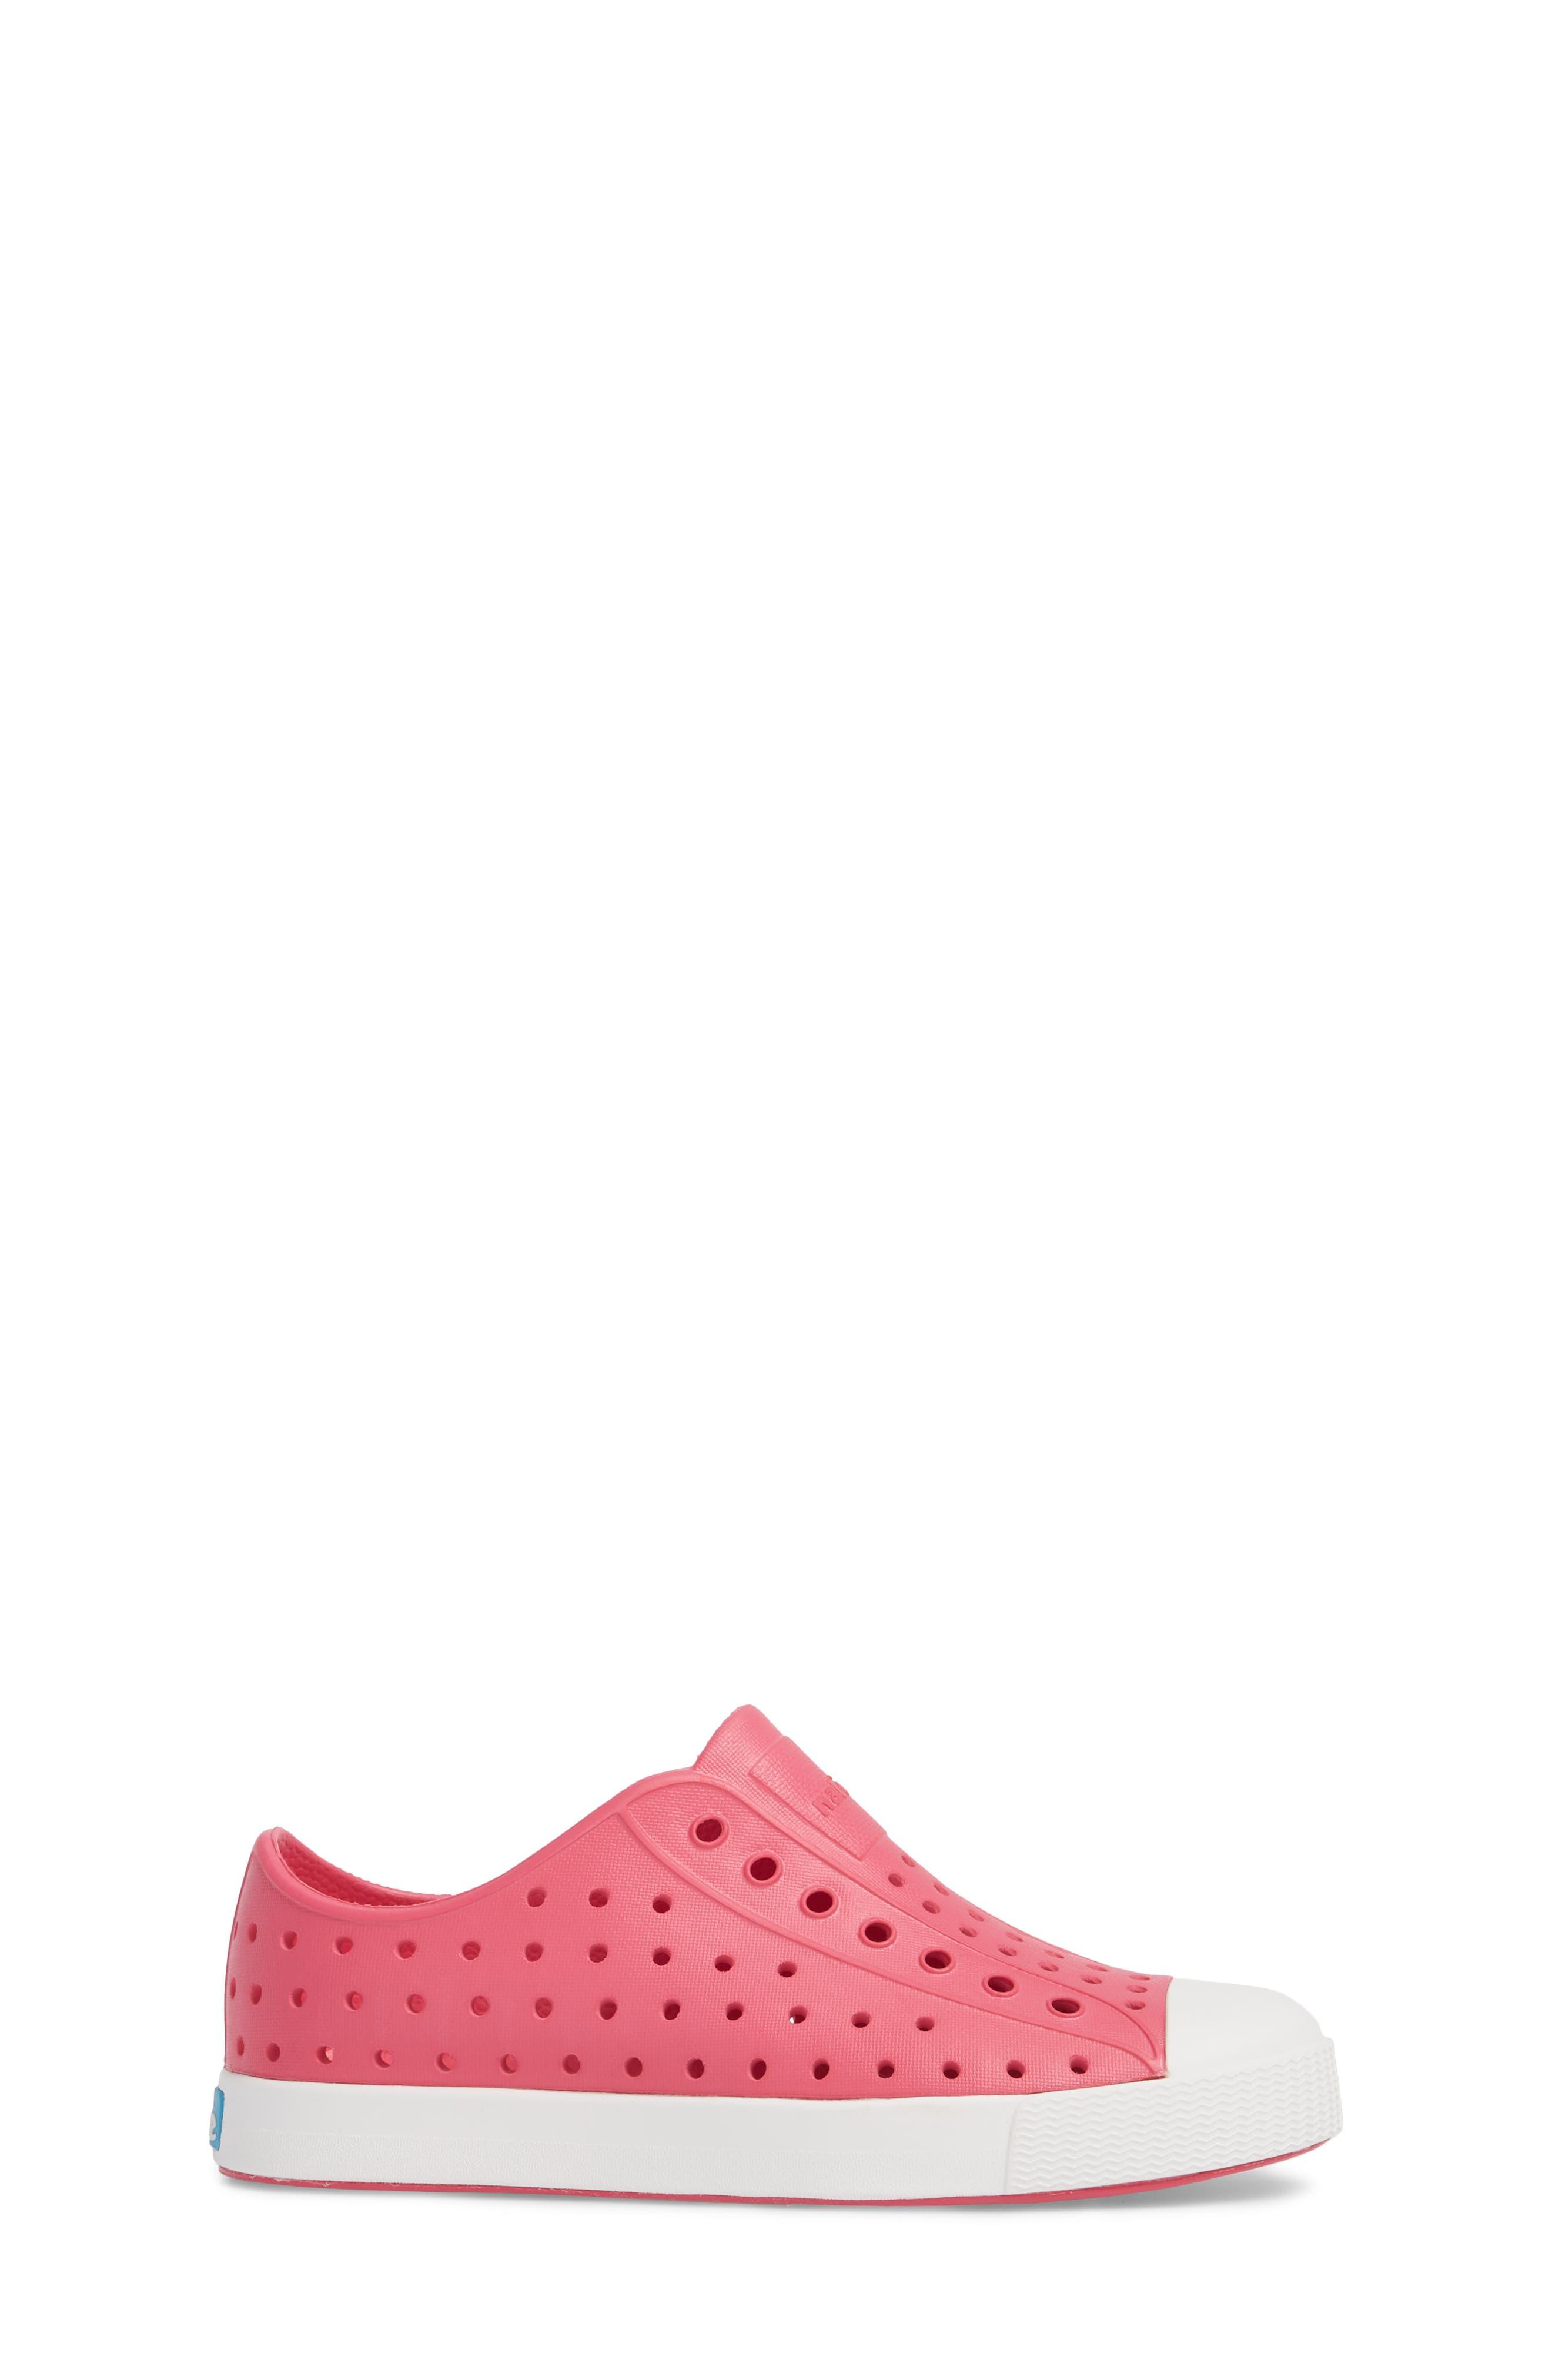 'Jefferson' Water Friendly Slip-On Sneaker,                             Alternate thumbnail 131, color,